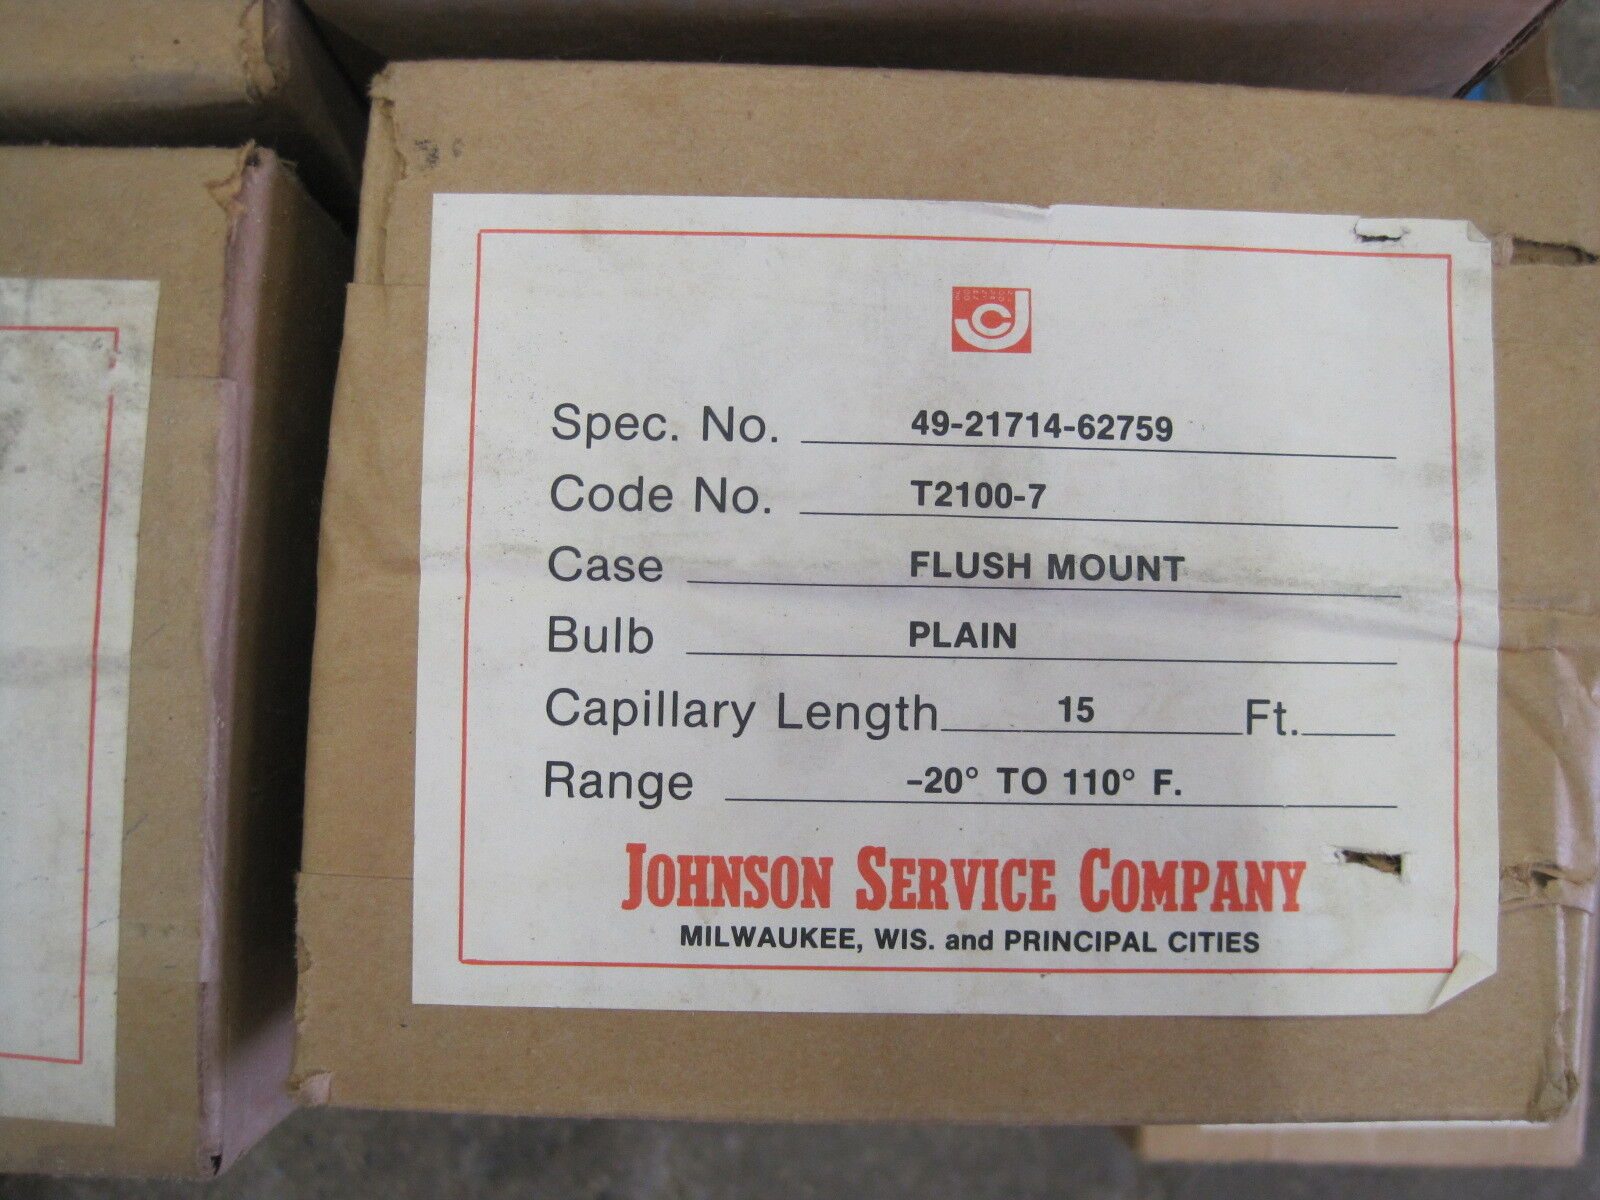 NEW JOHNSON SERVICE CO. 49-21714-62759 TEMPERATURE GAUGE 492171462759